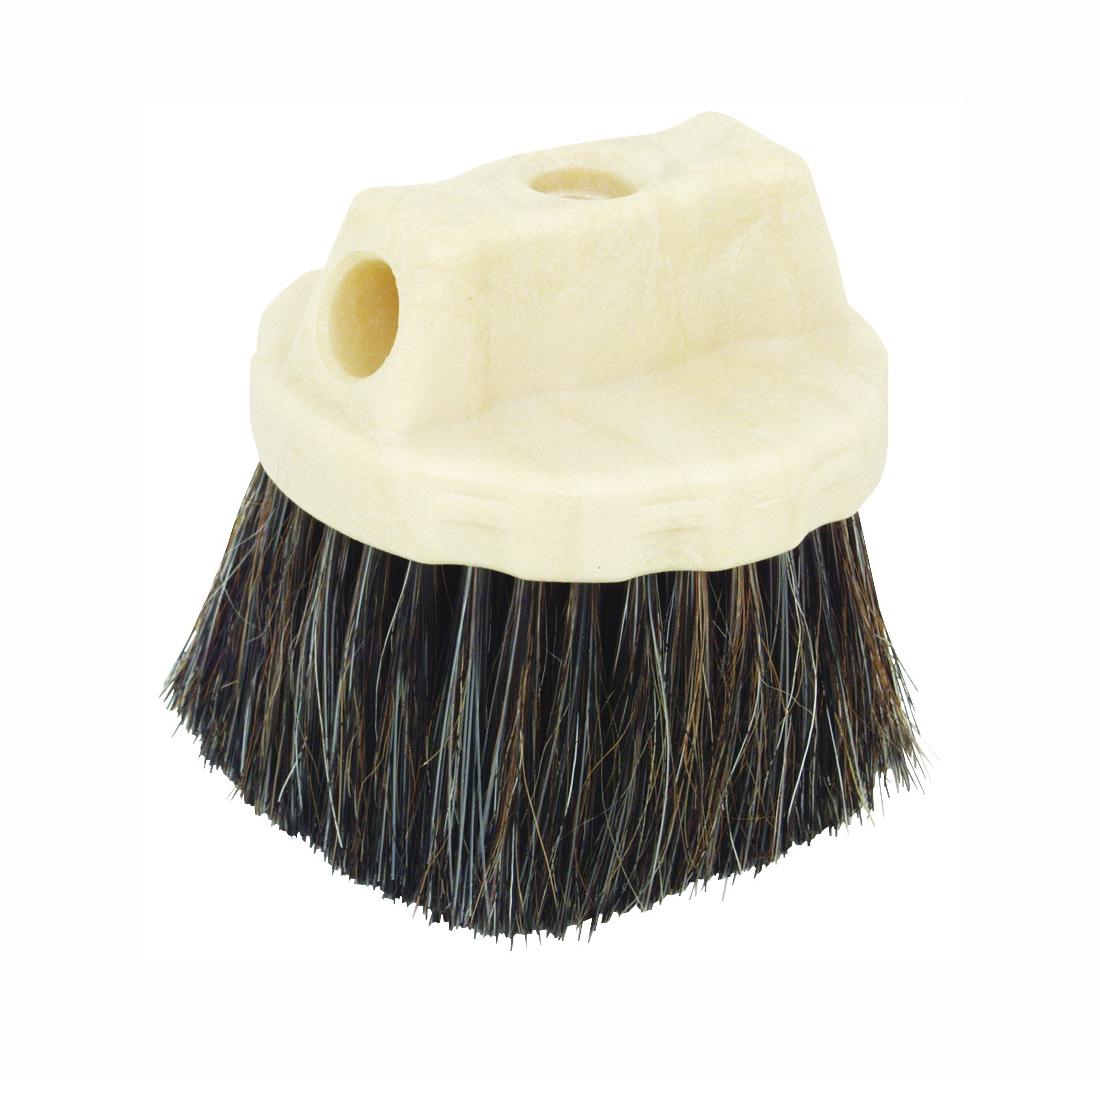 Picture of DQB 11730 Washing Brush, 2-1/2 in L Trim, 4-1/2 in OAL, Polypropylene Trim